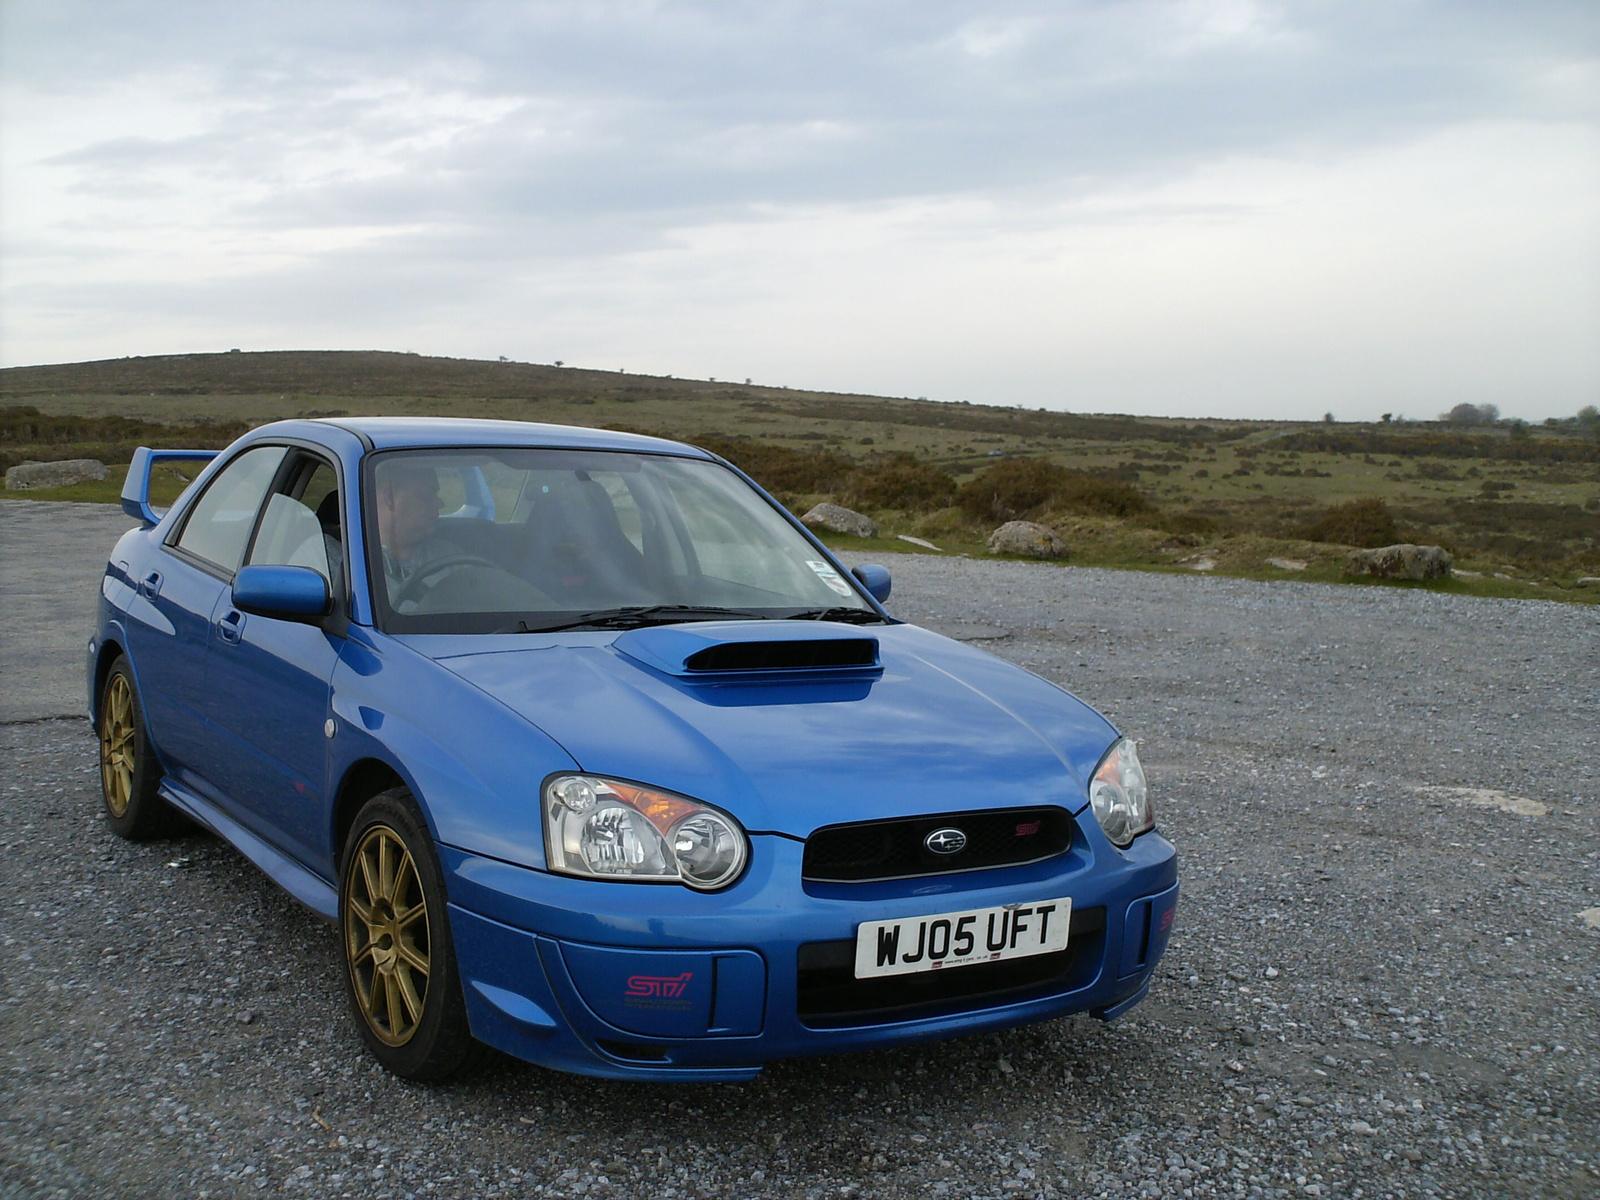 2005 Subaru Wrx Sti Wallpaper Wallpapersafari